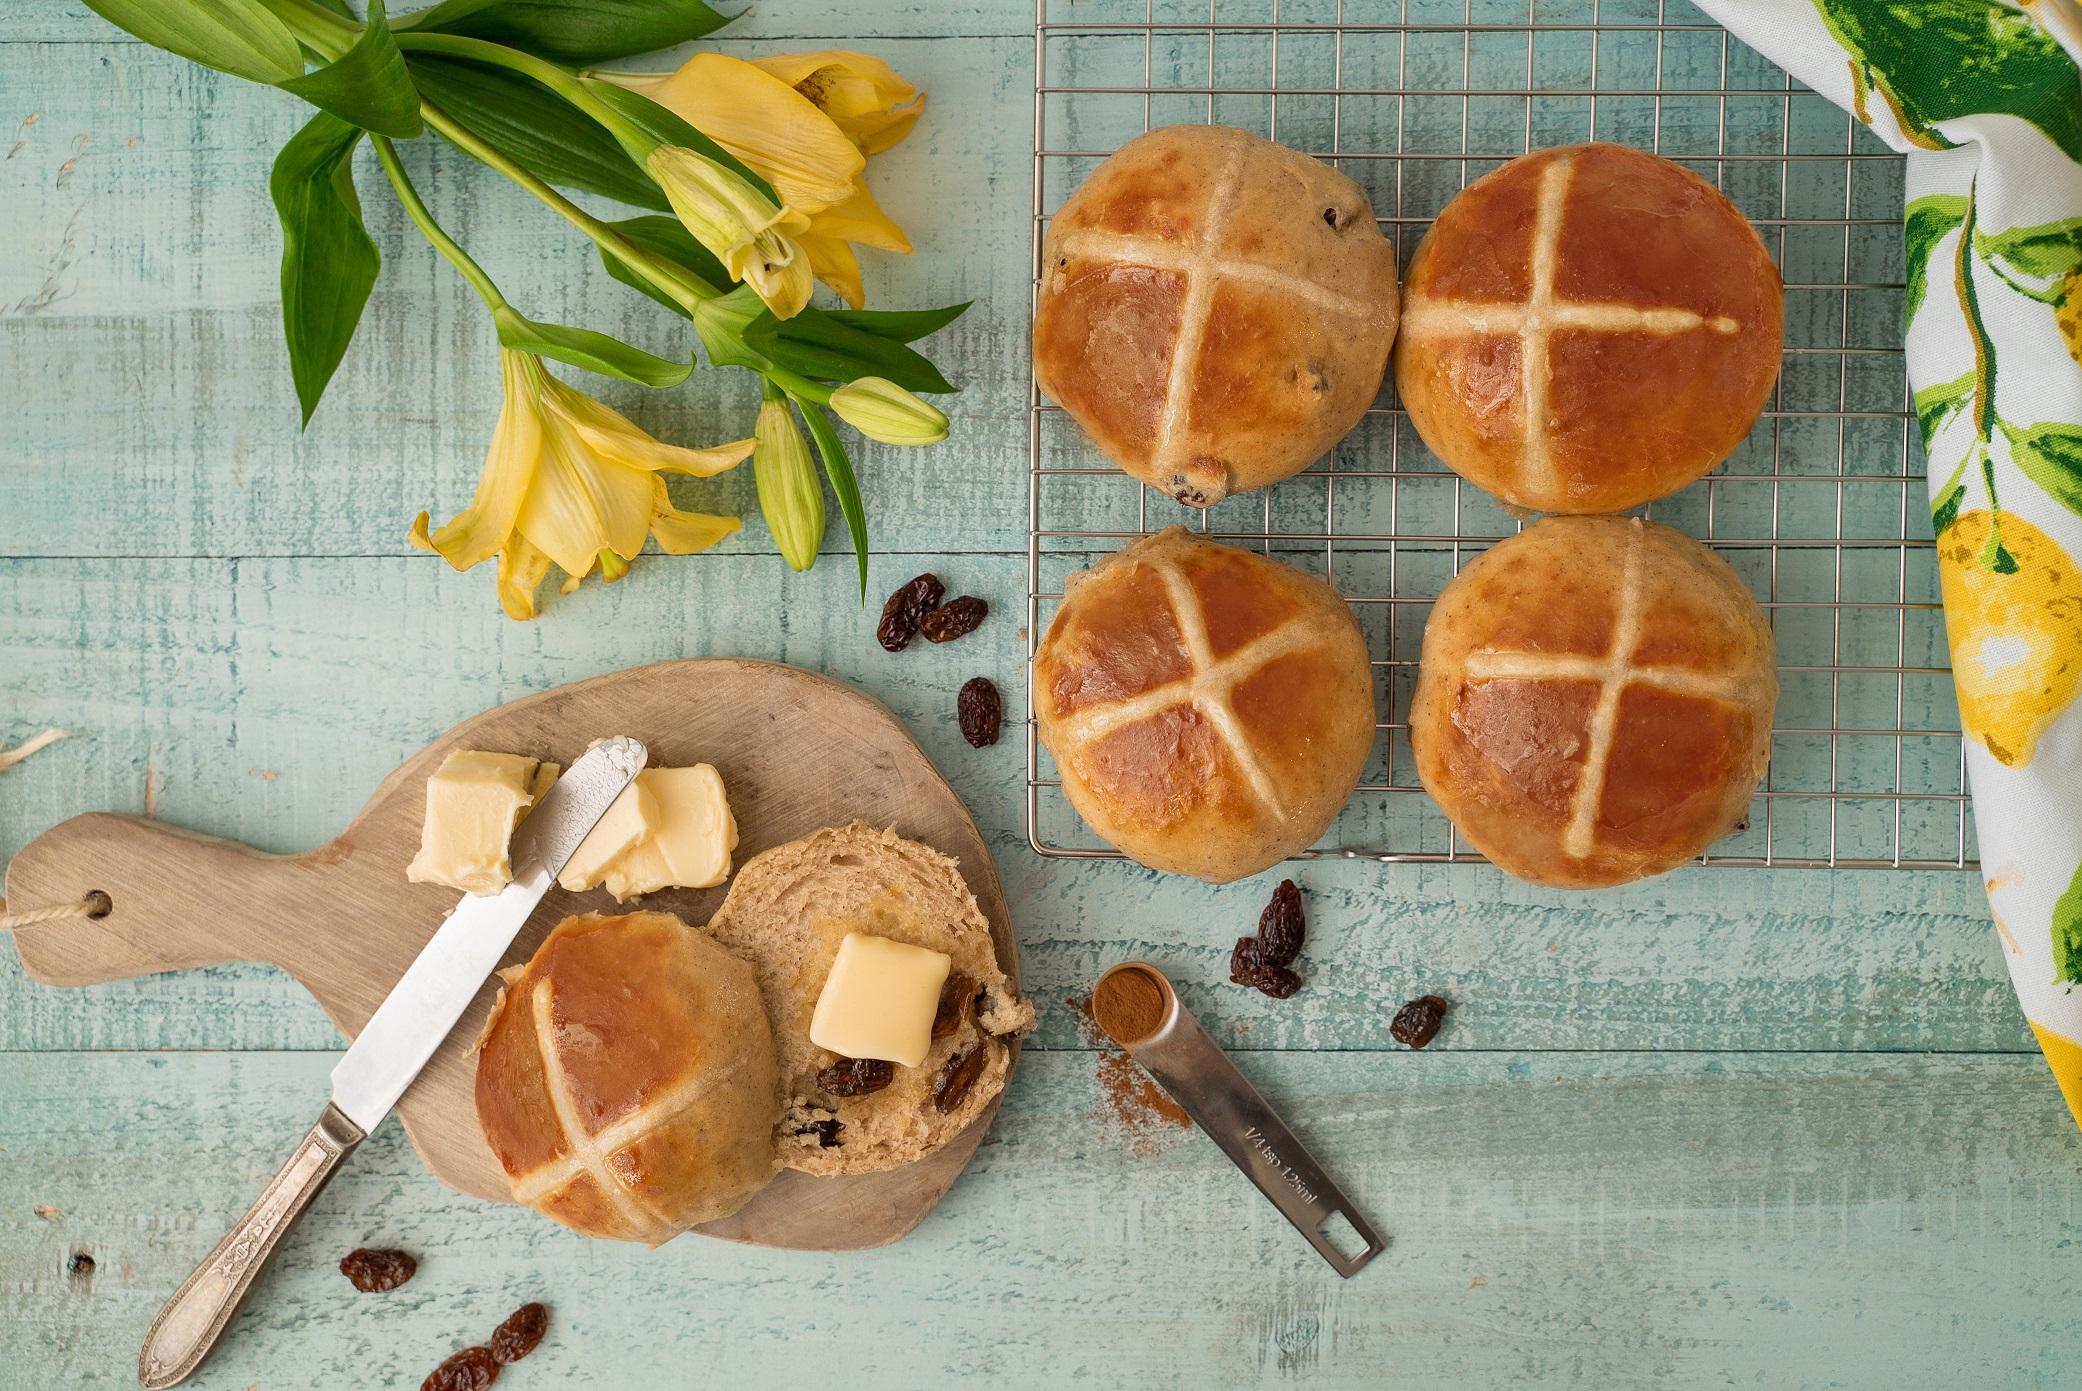 Four Egg-ceptional Recipes for Easter